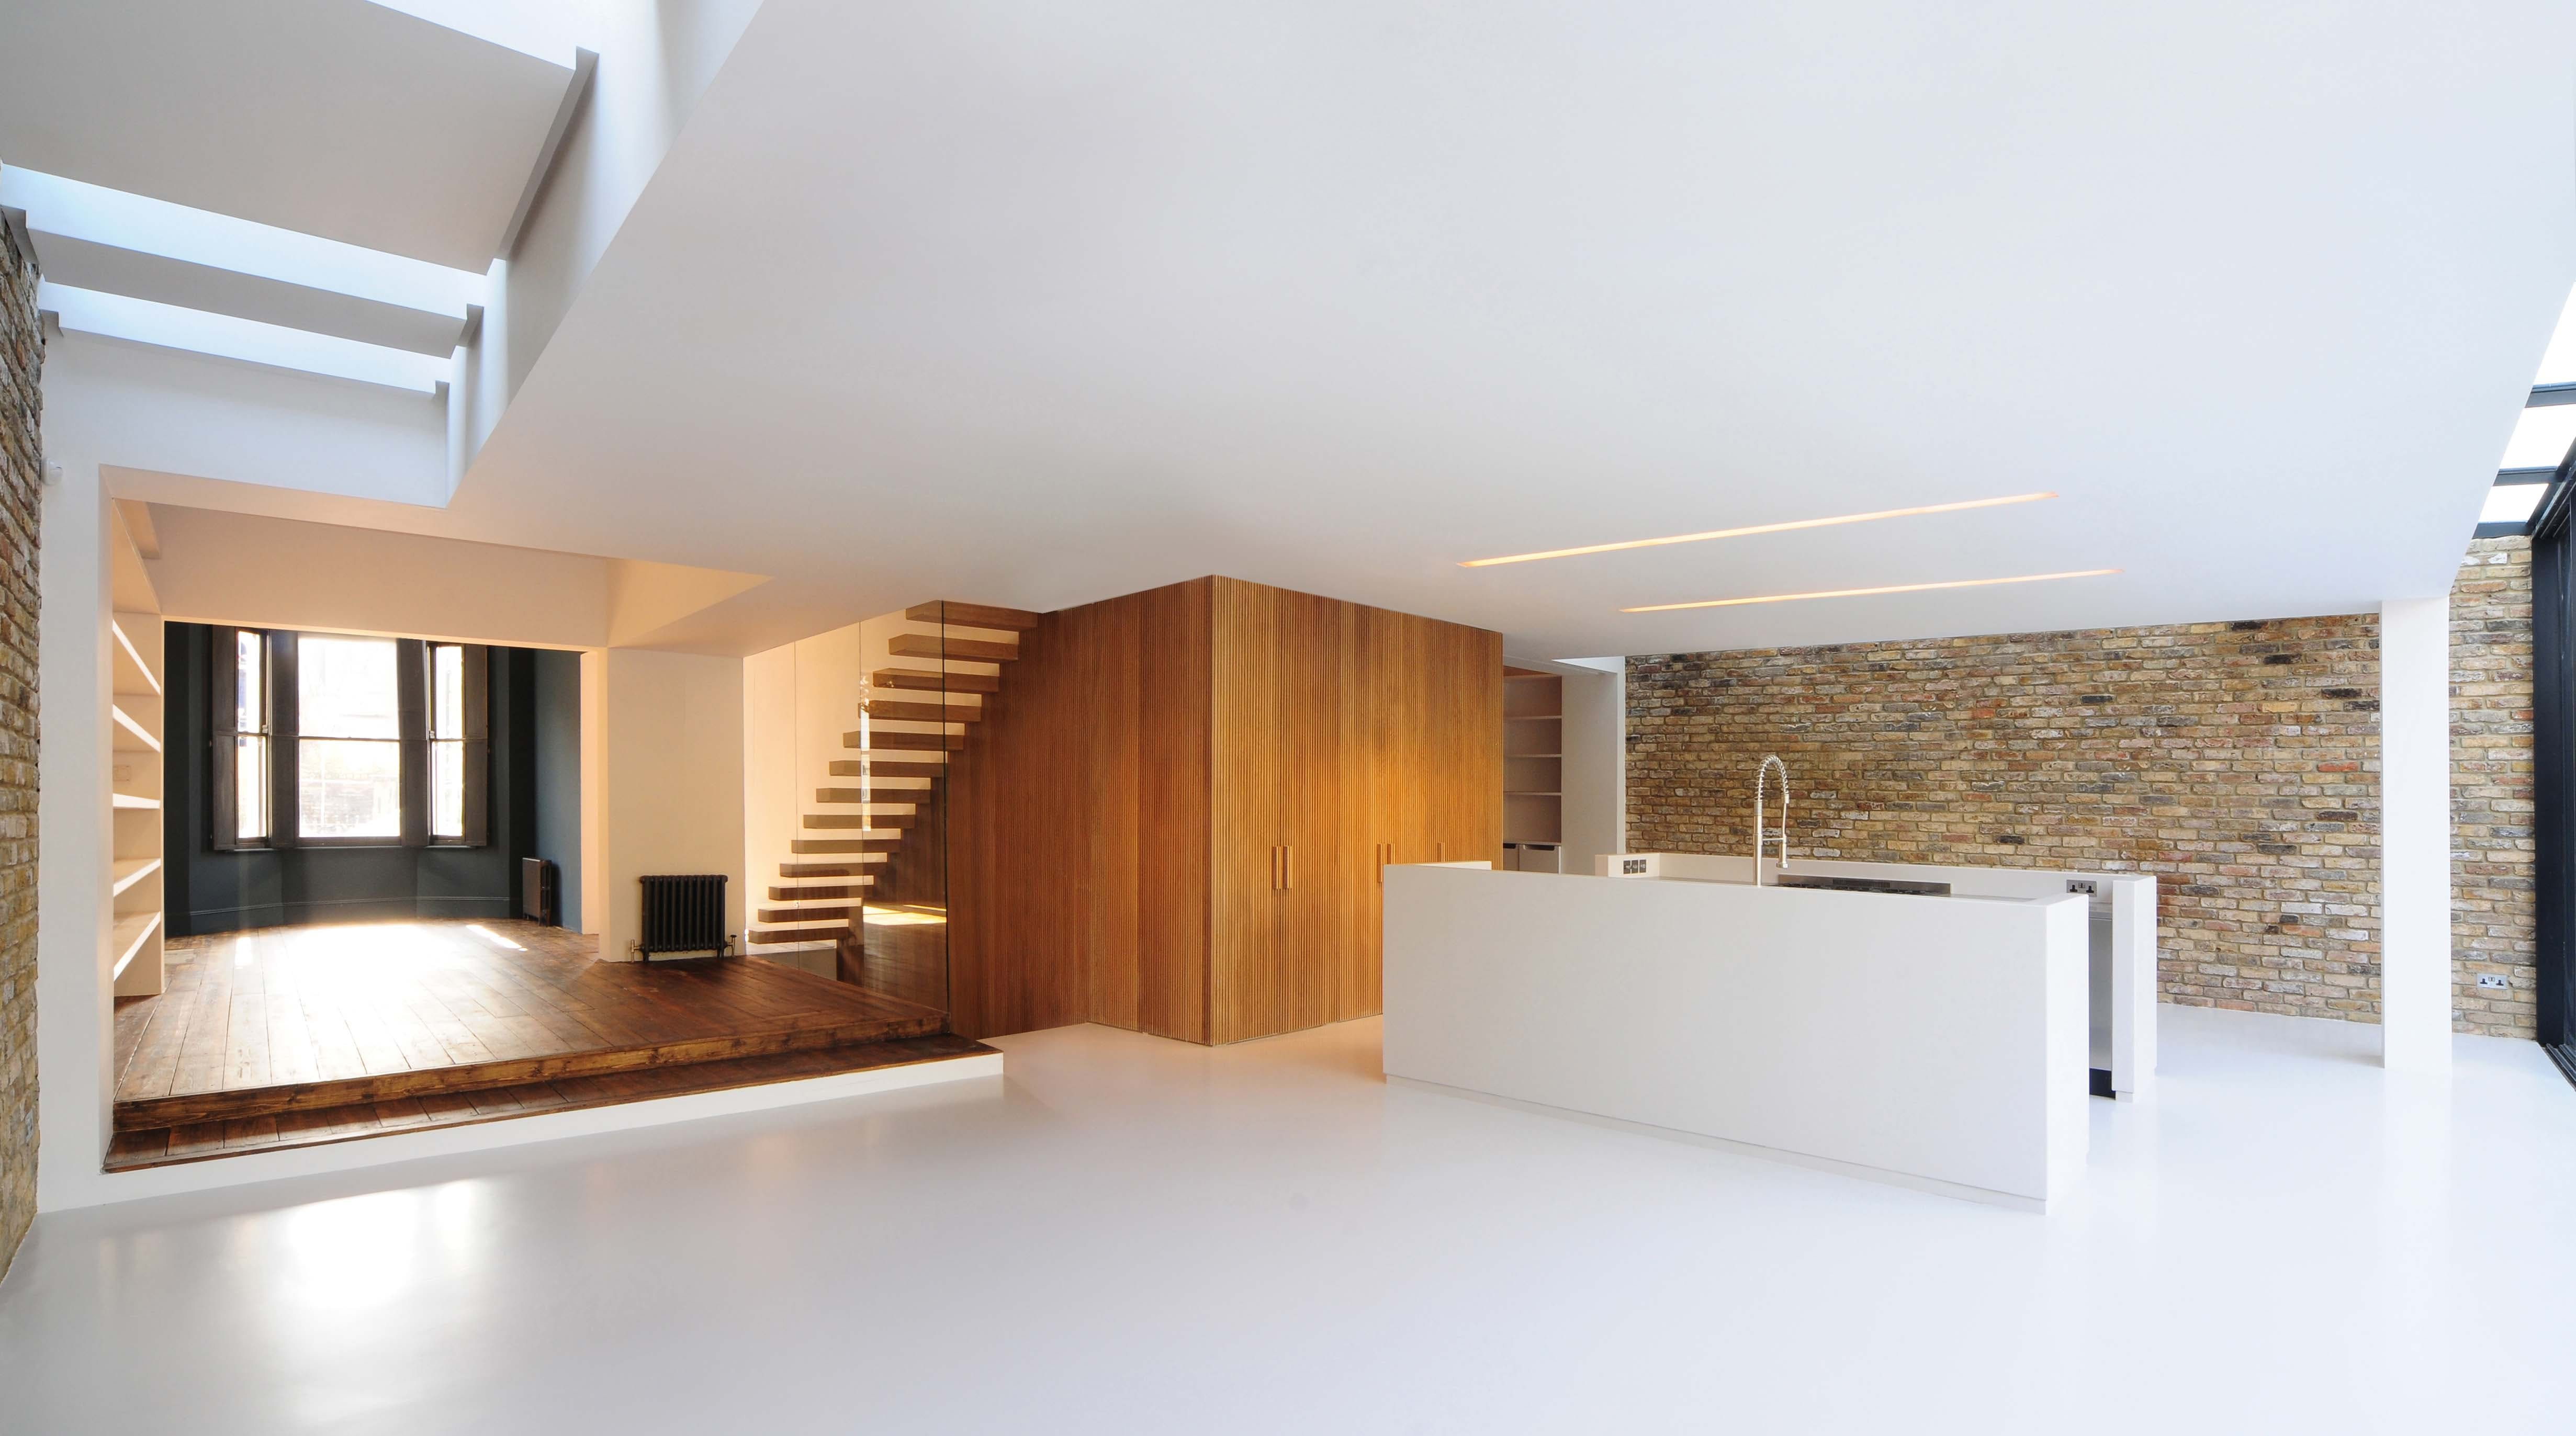 homemade bureau de change archinect. Black Bedroom Furniture Sets. Home Design Ideas